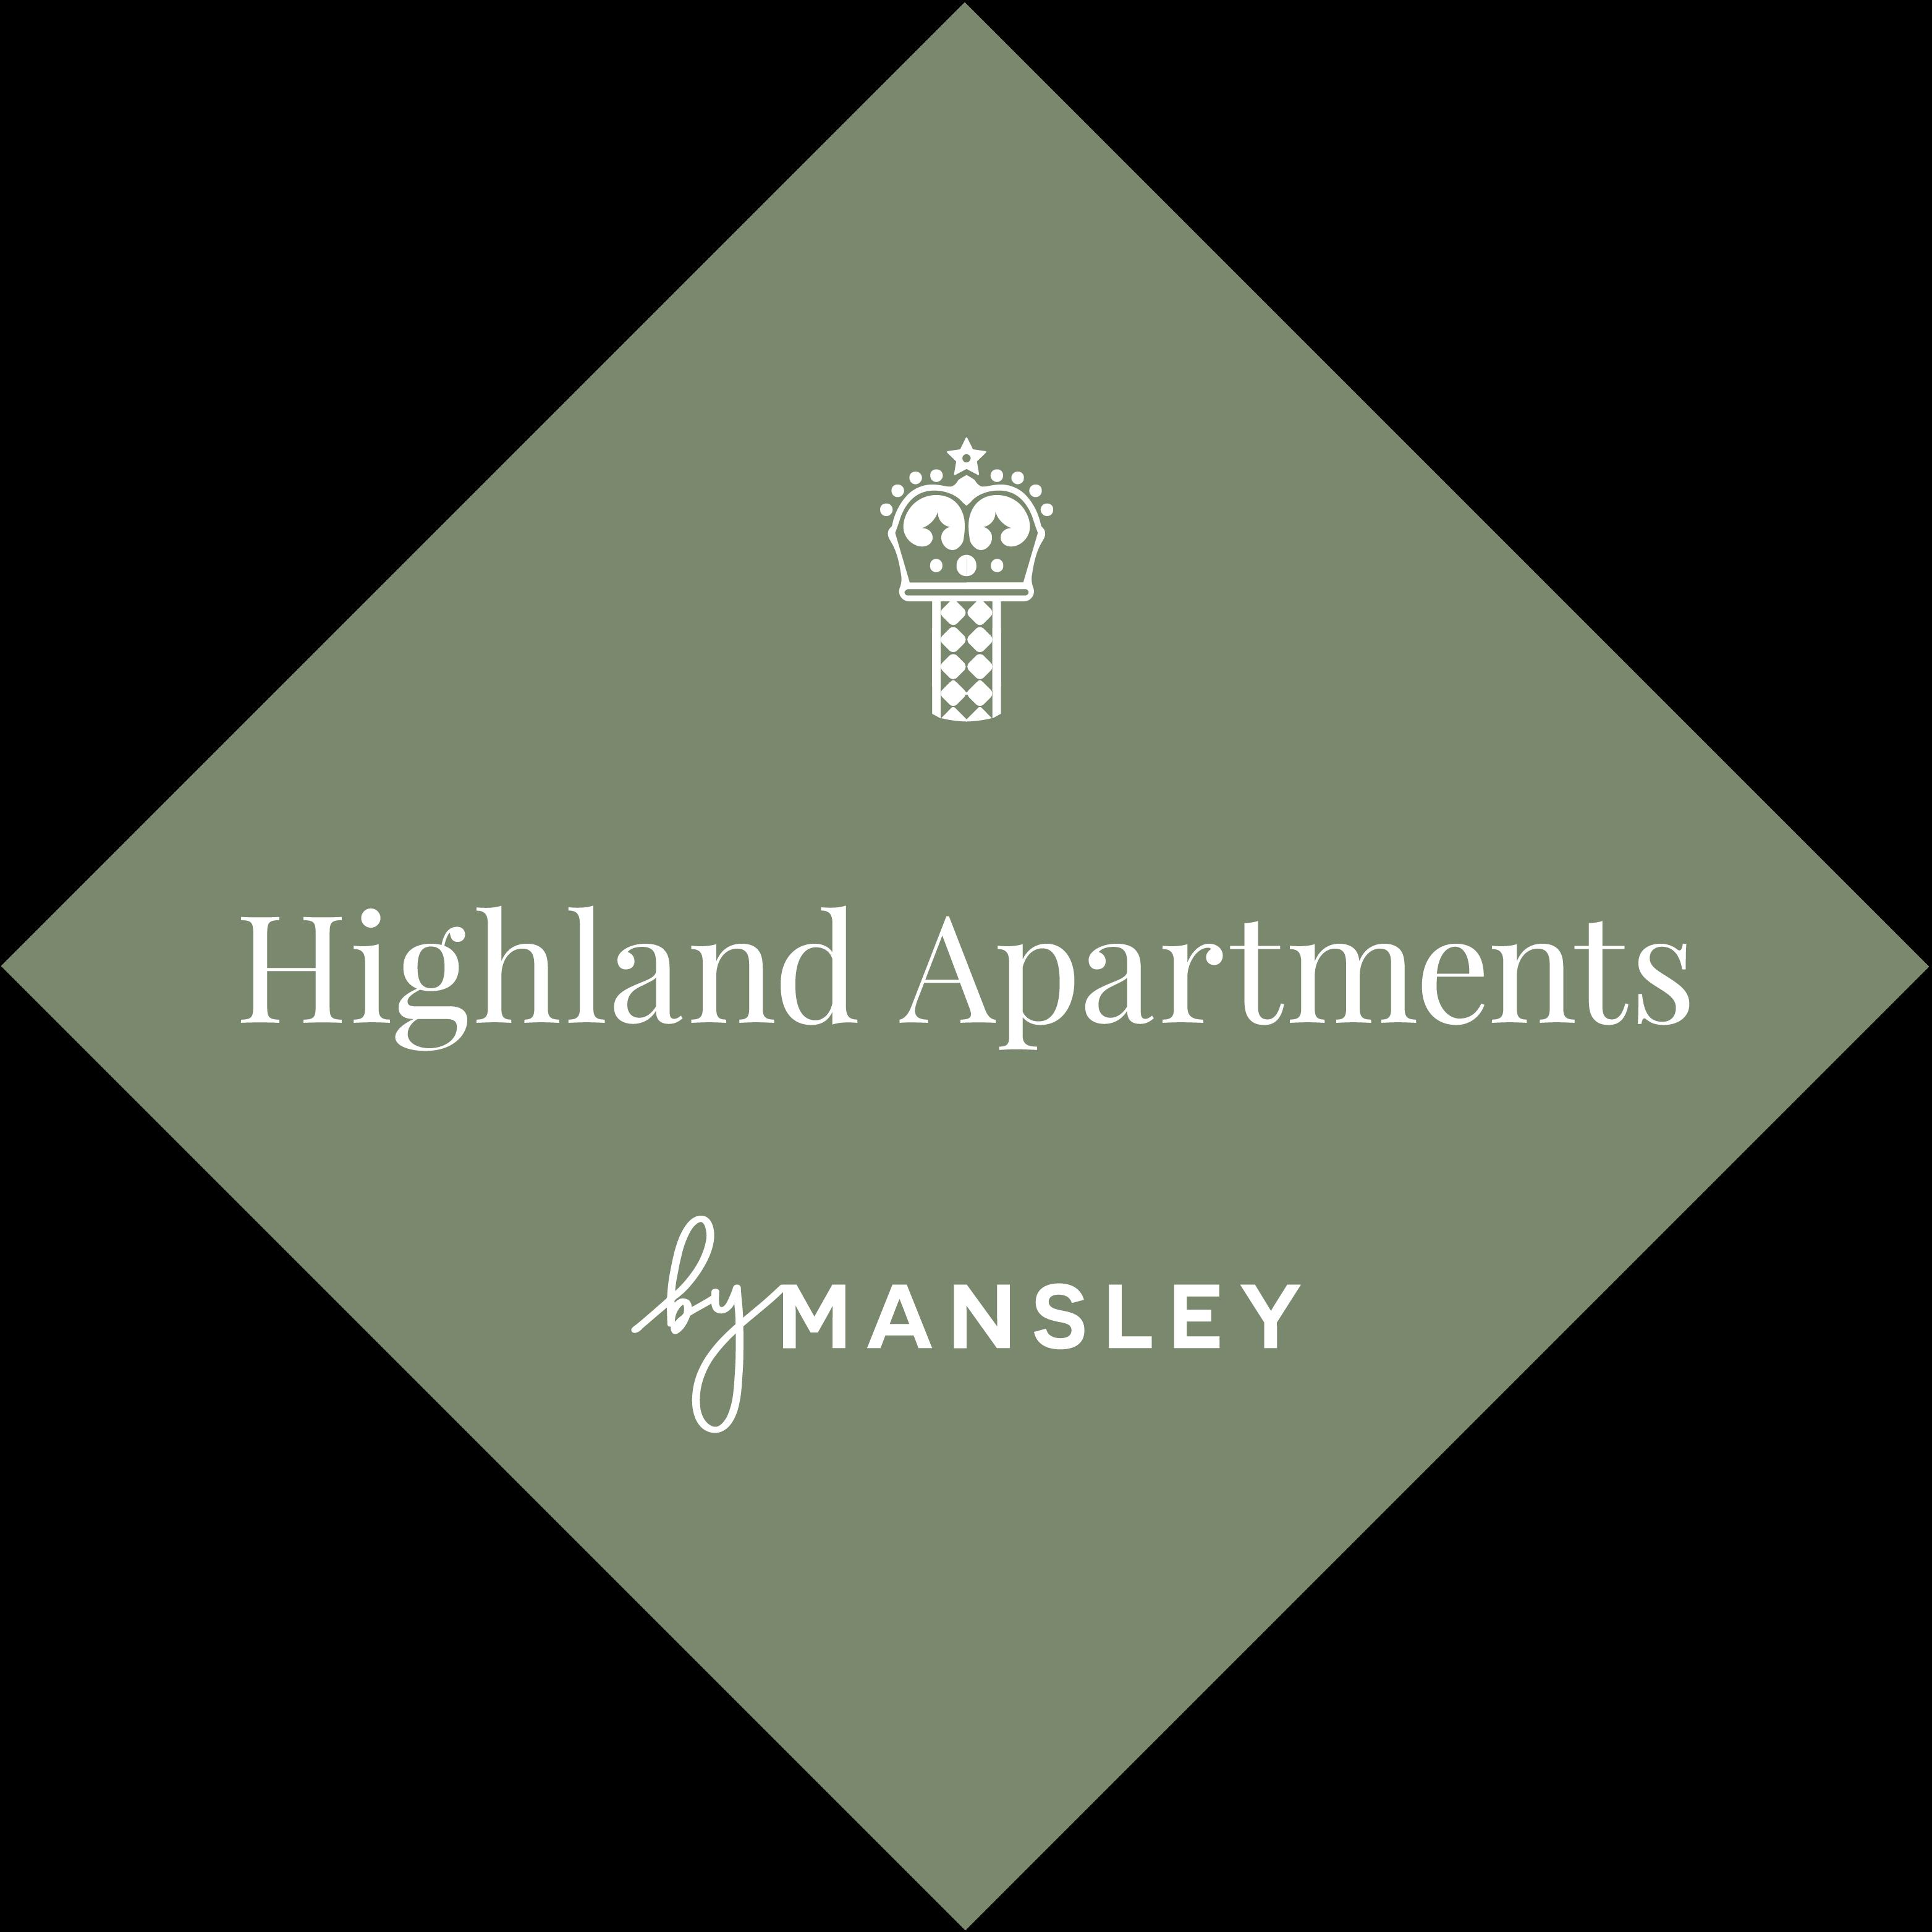 highland apartments diamond icon